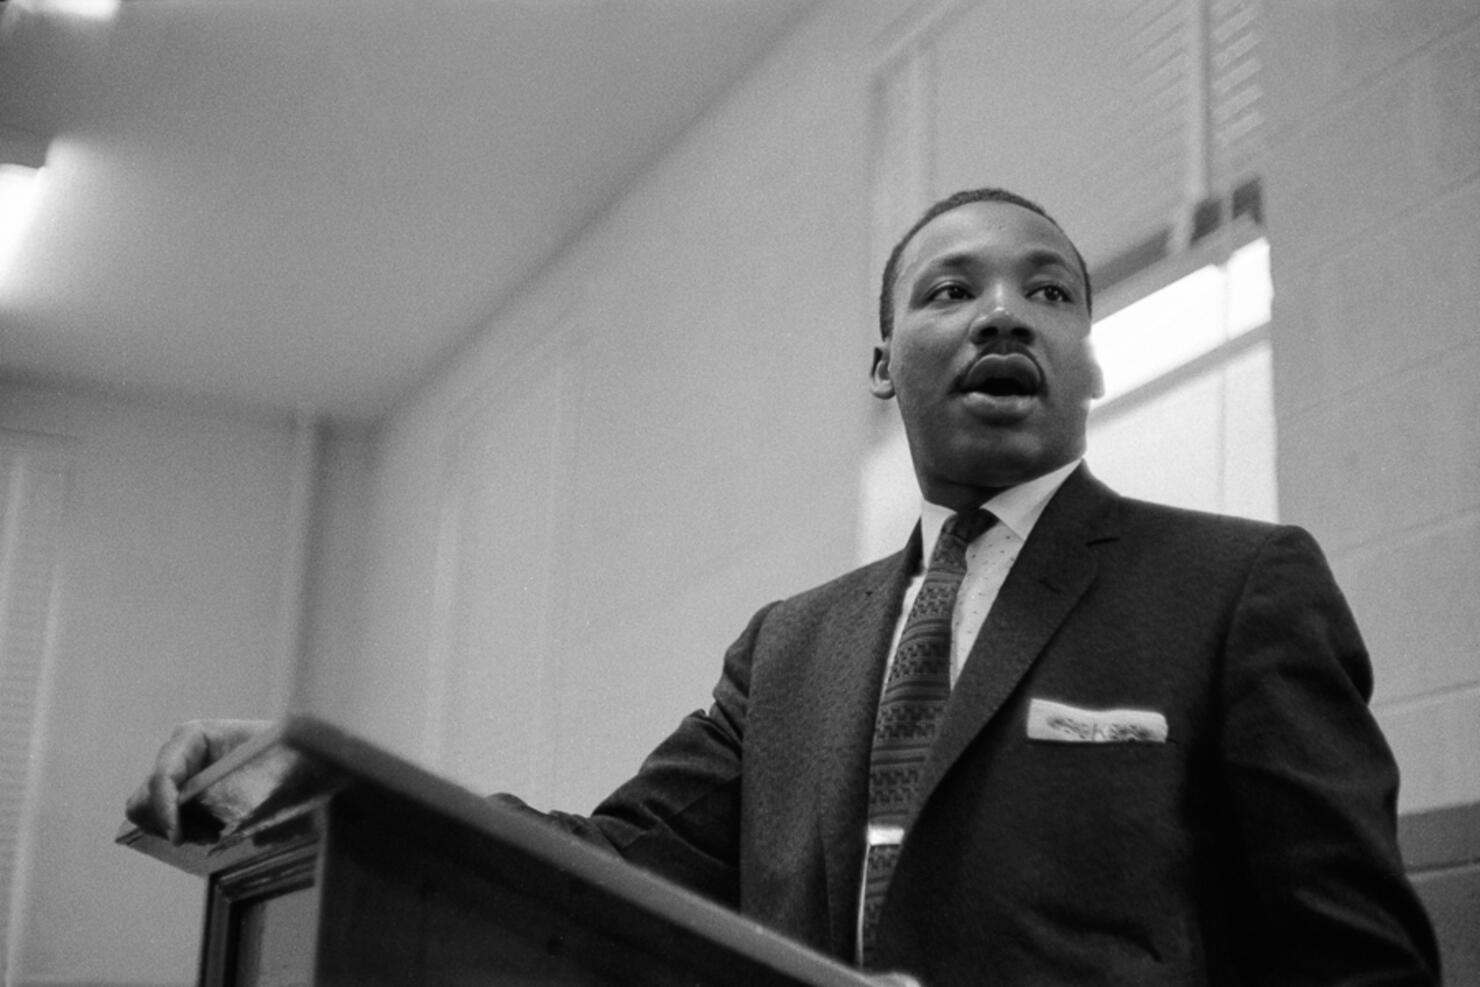 Dr. King Addresses Meeting